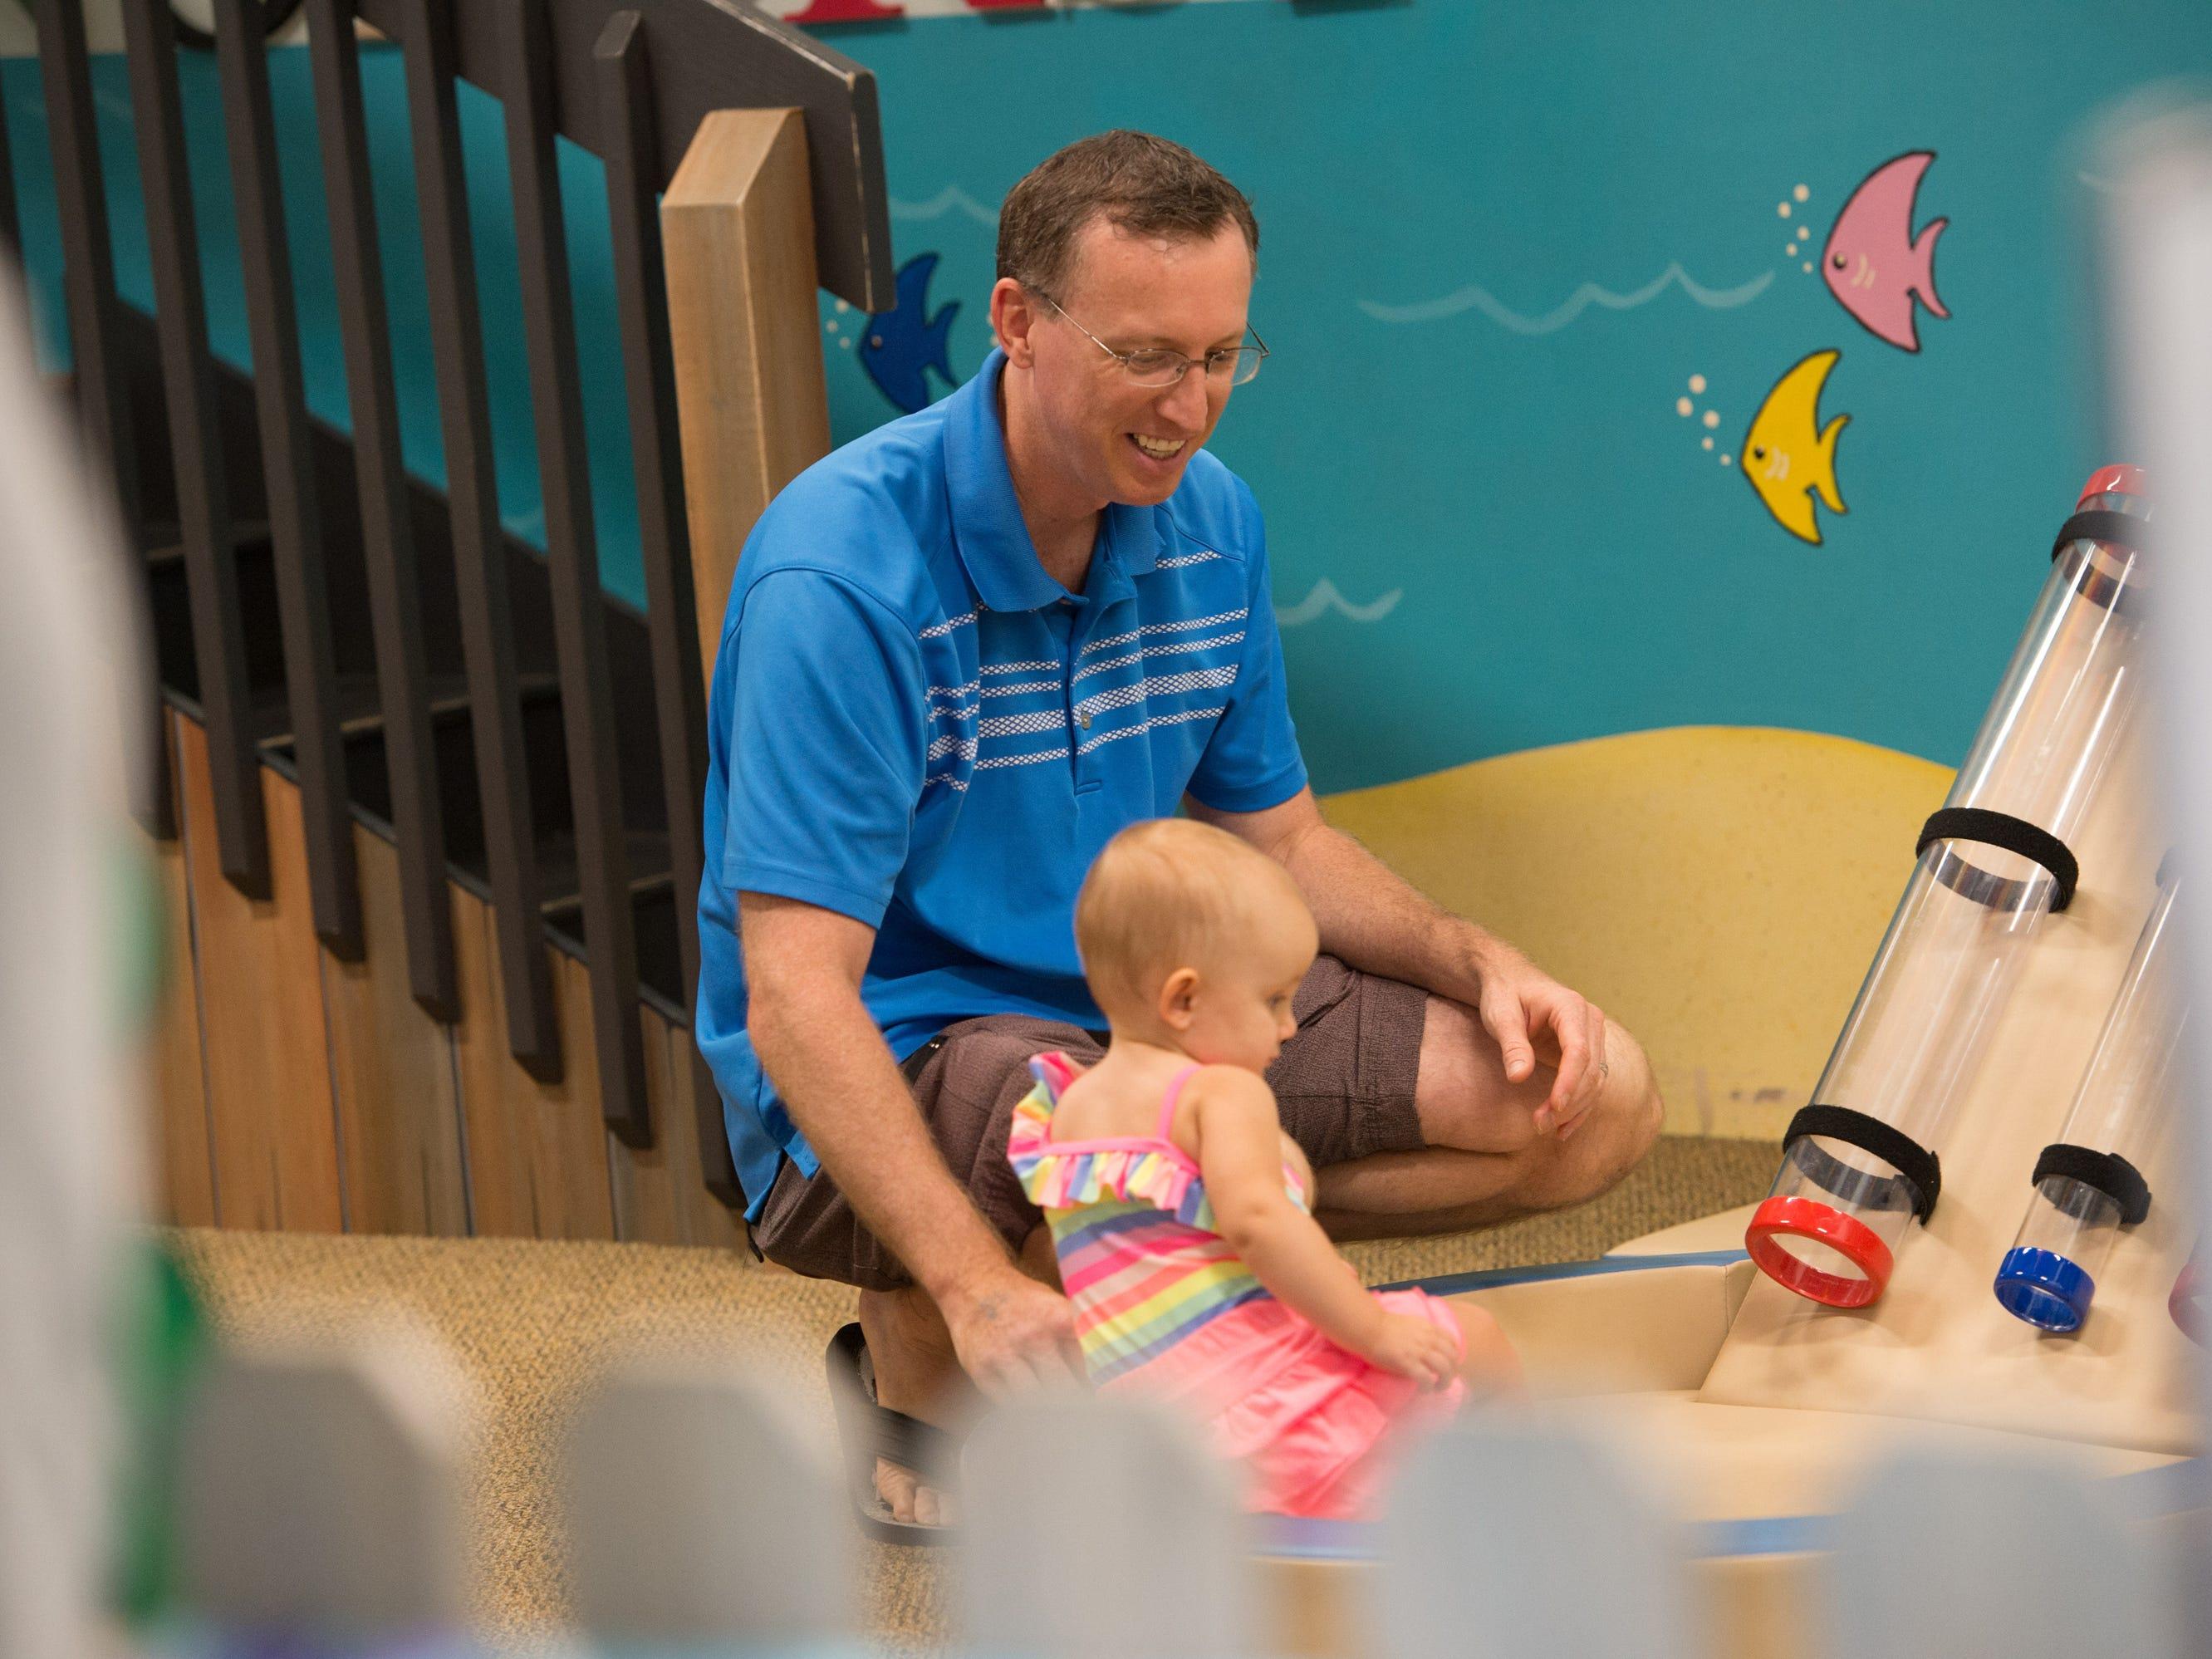 The Autumn Adventure event at The Children's Museum of the Treasure Coast on Saturday, Sept. 15, 2018 in Jensen Beach.